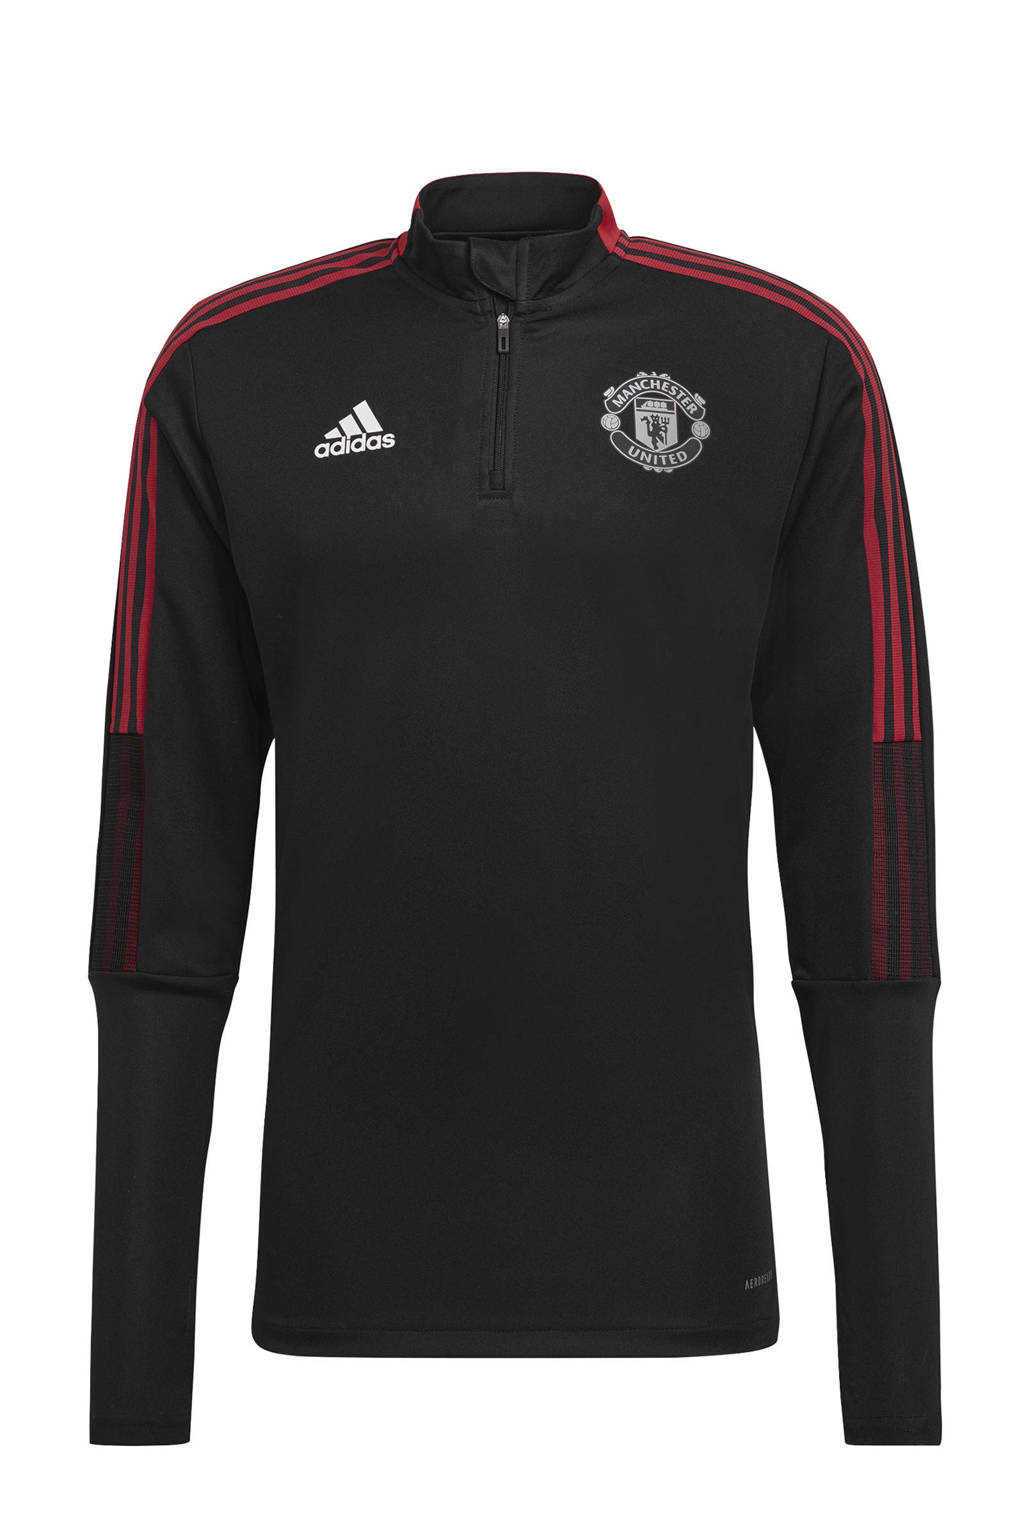 adidas Performance Senior Manchester United voetbalsweater training zwart/rood, Zwart